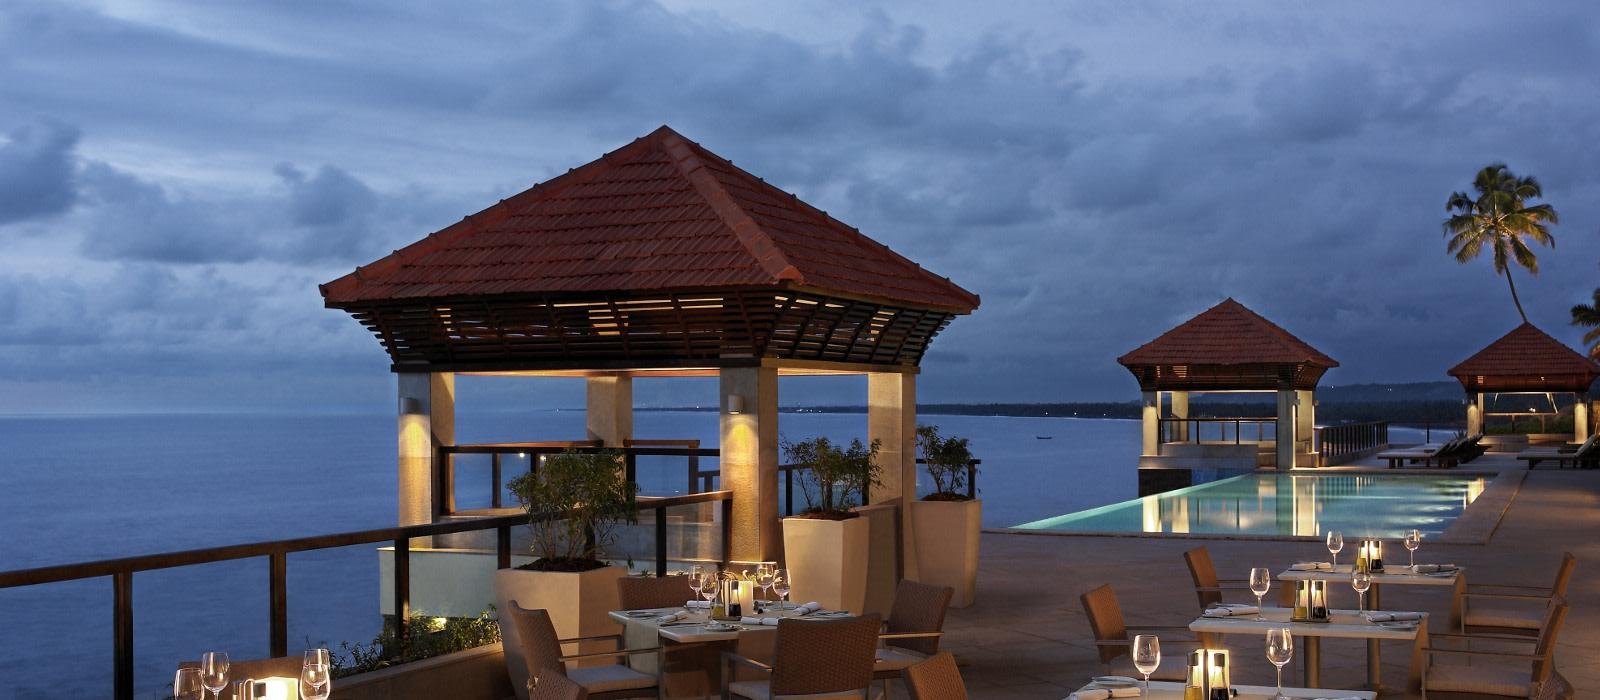 Hotel Leela Palace Zentral- & Westindien